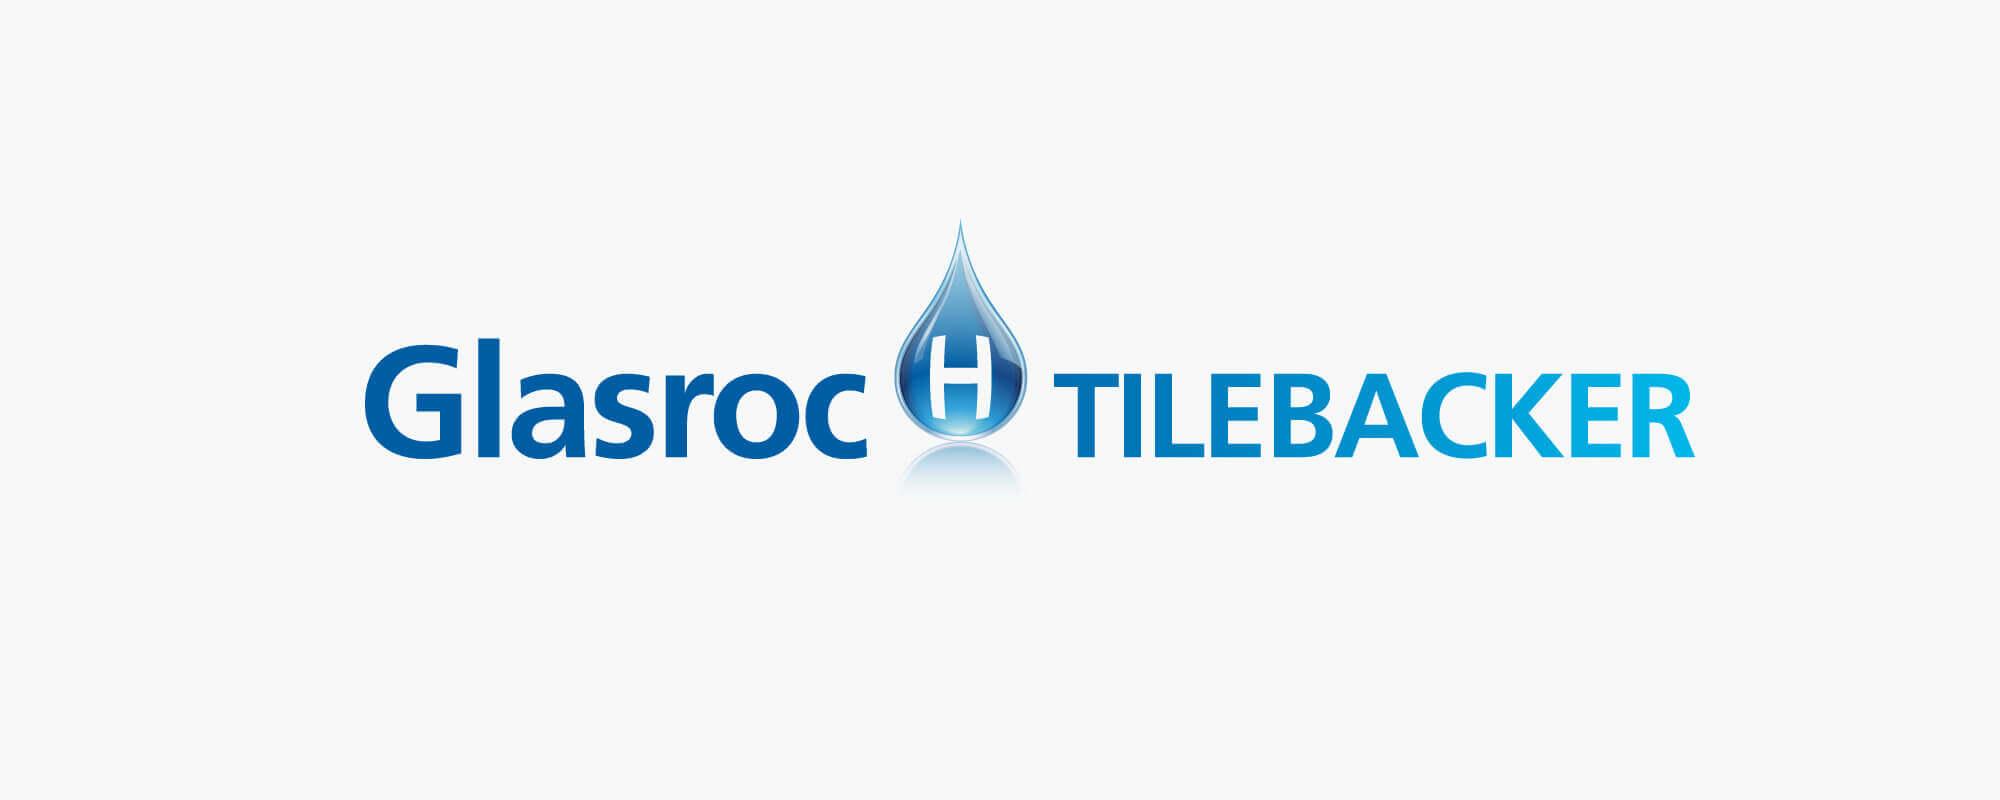 Glasroc Tilebacker logo